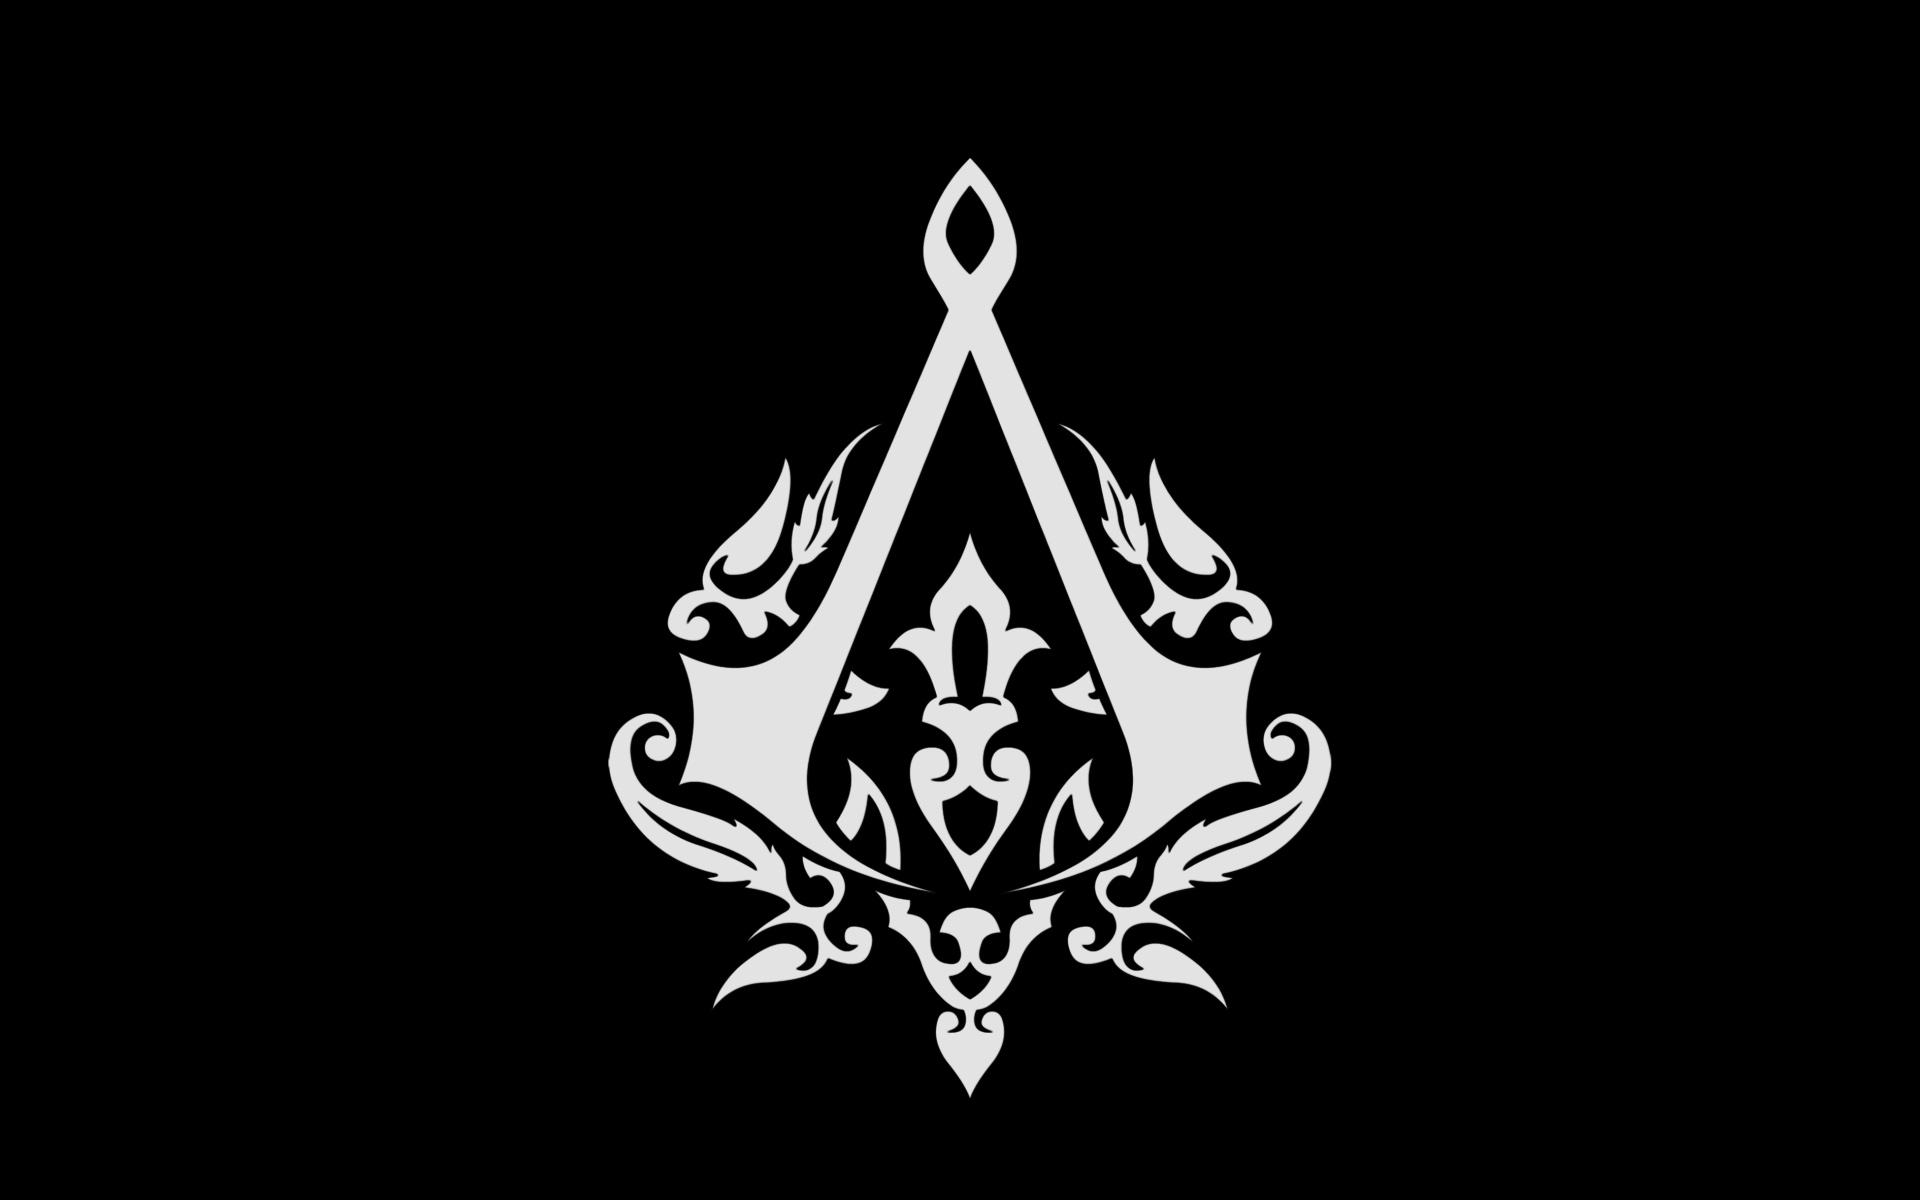 Assassins Creed Logo wallpaper 1920x1200